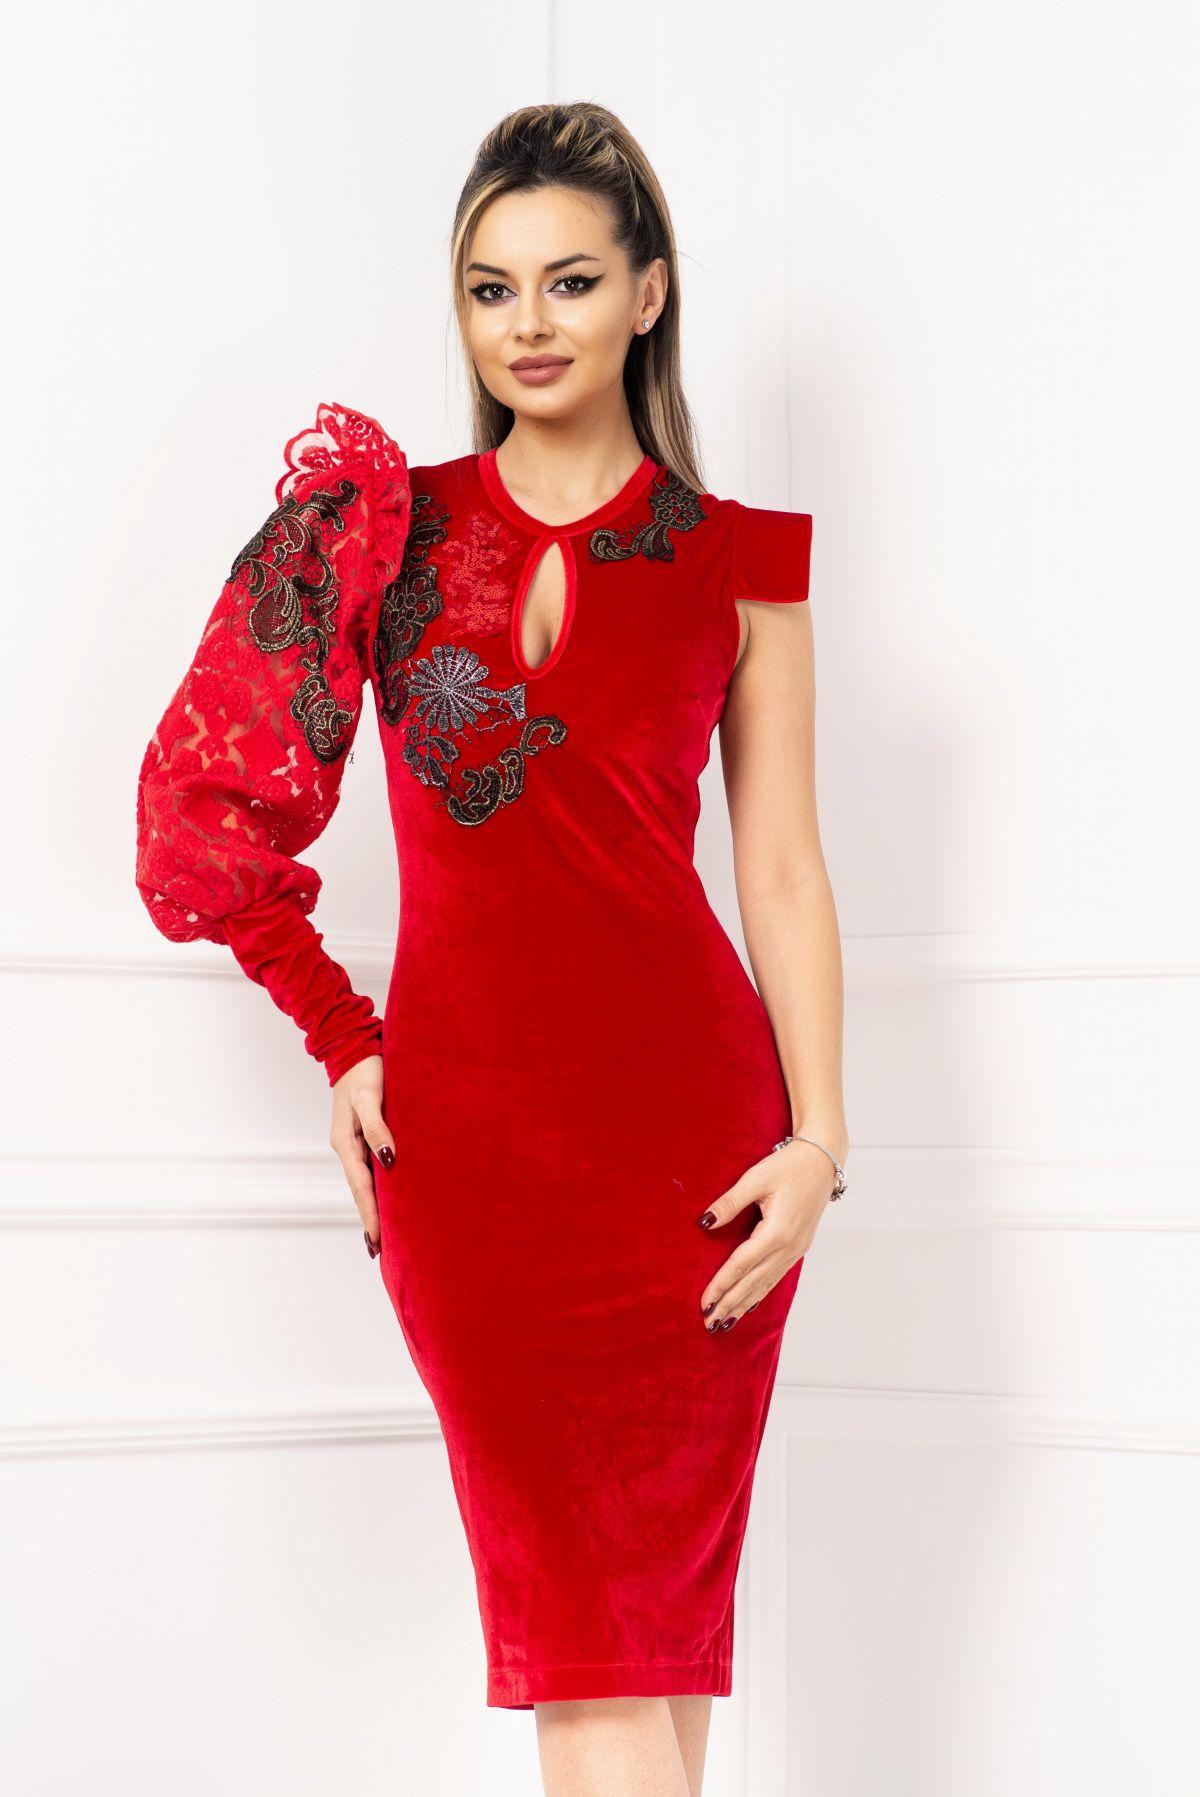 Rochie eleganta din catifea cu o maneca lunga brodata Venezia-Artigiano-Moda